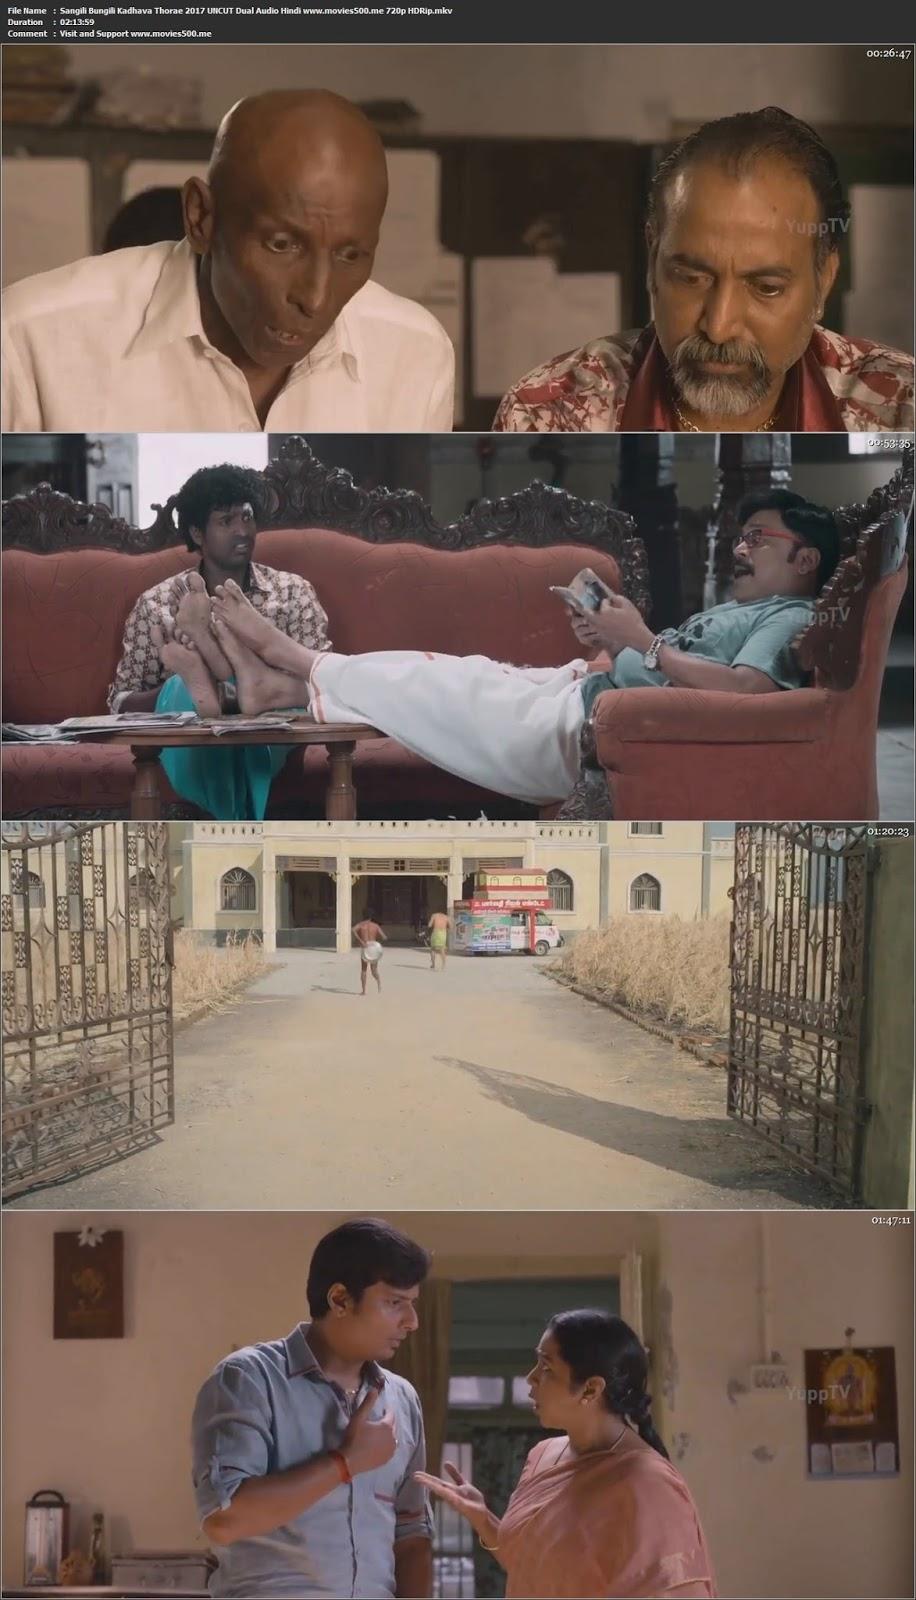 Sangili Bungili Kadhava Thorae 2017 UNCUT Dual Audio Hindi HDRip 720p at sweac.org